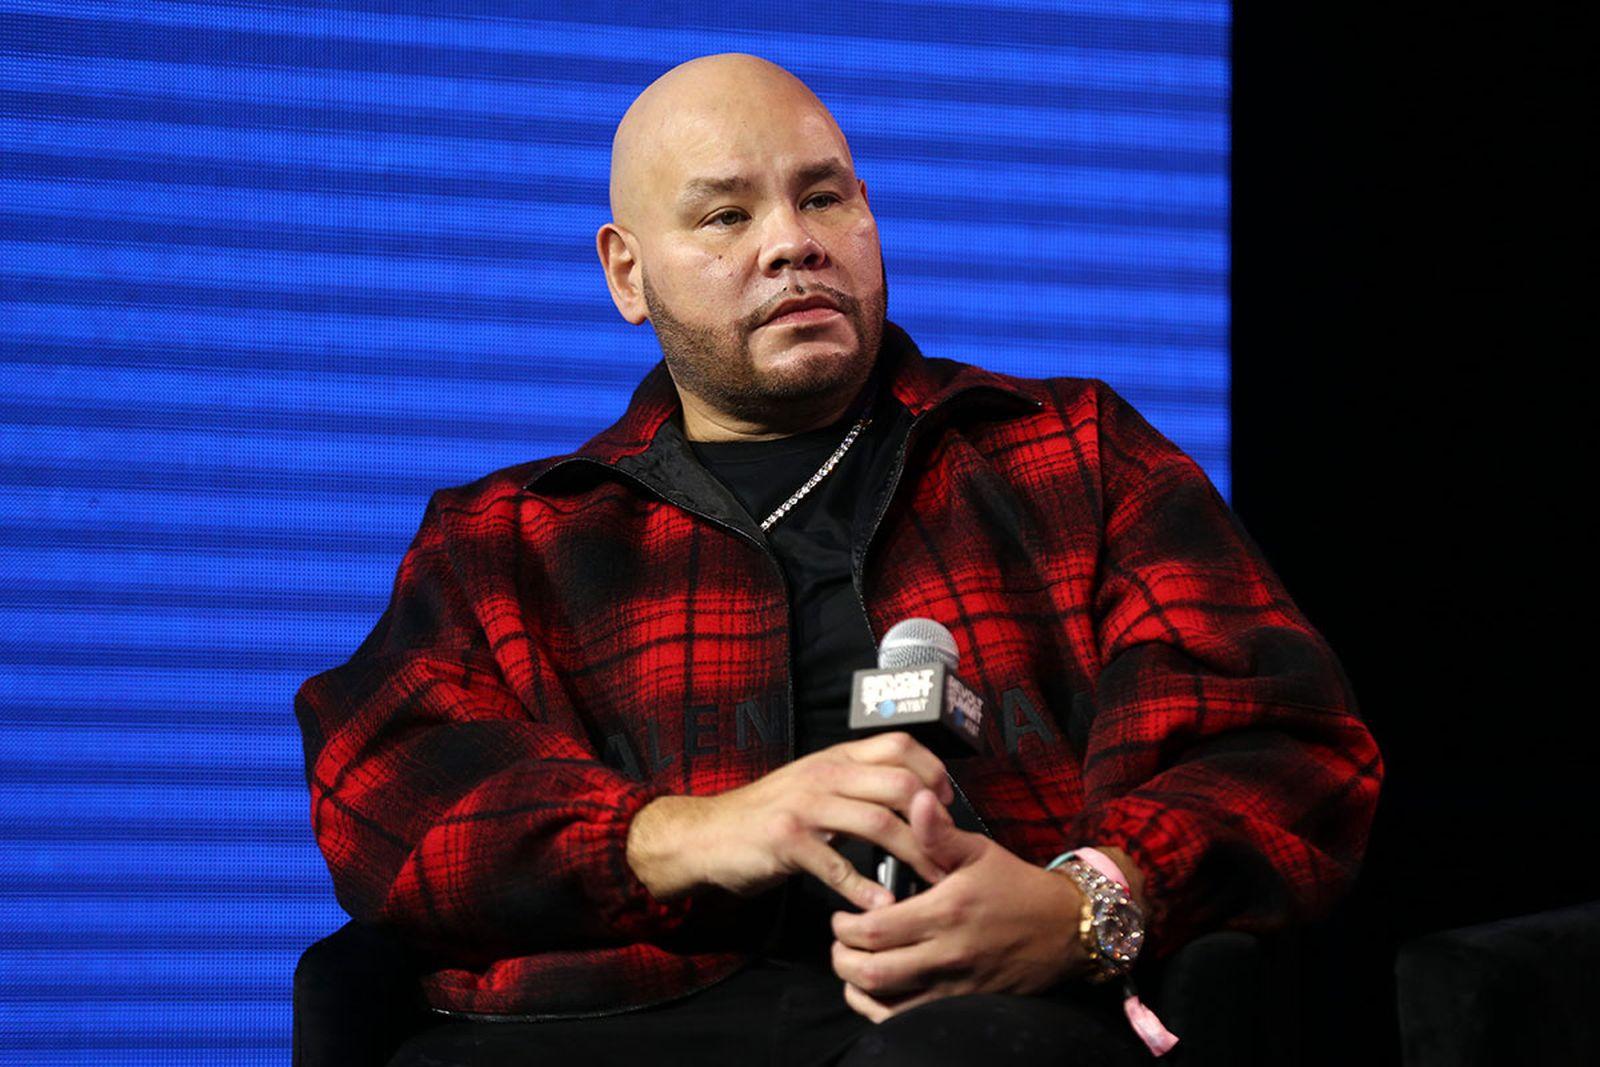 Fat Joe onstage at the REVOLT X AT&T Host REVOLT Summit